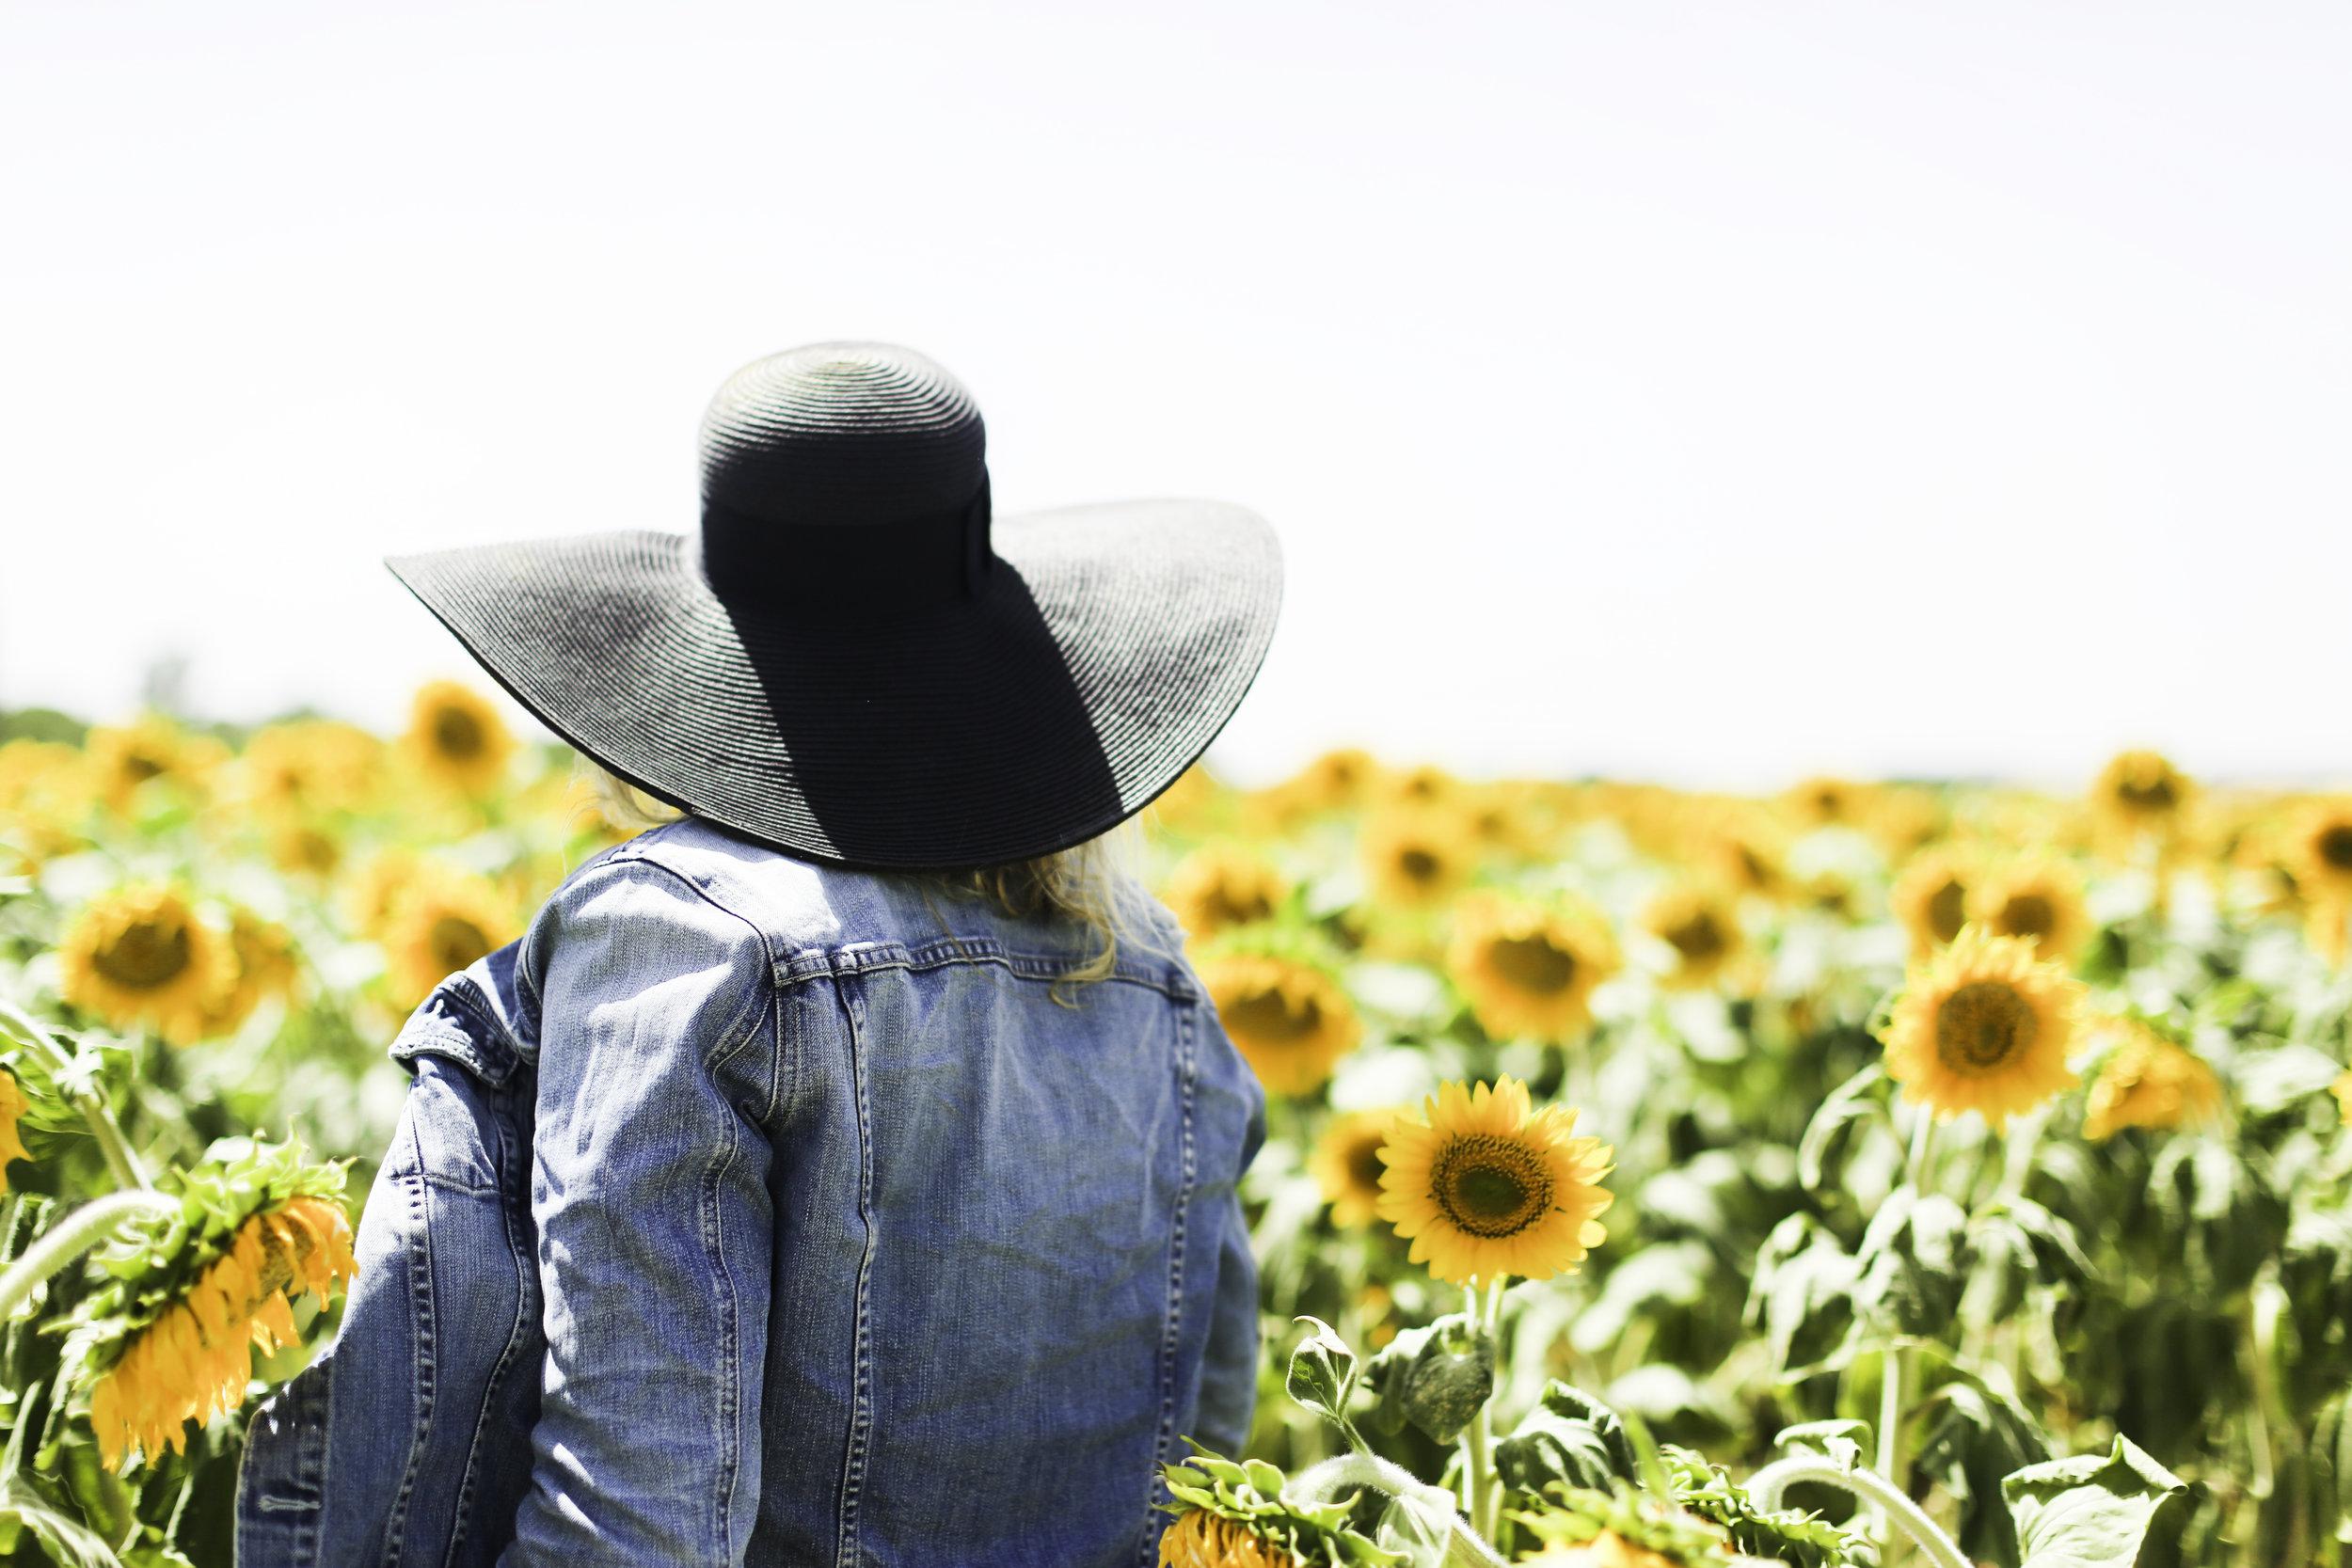 7W1A2781_sunflowers_spain_2_ritathompson.jpg